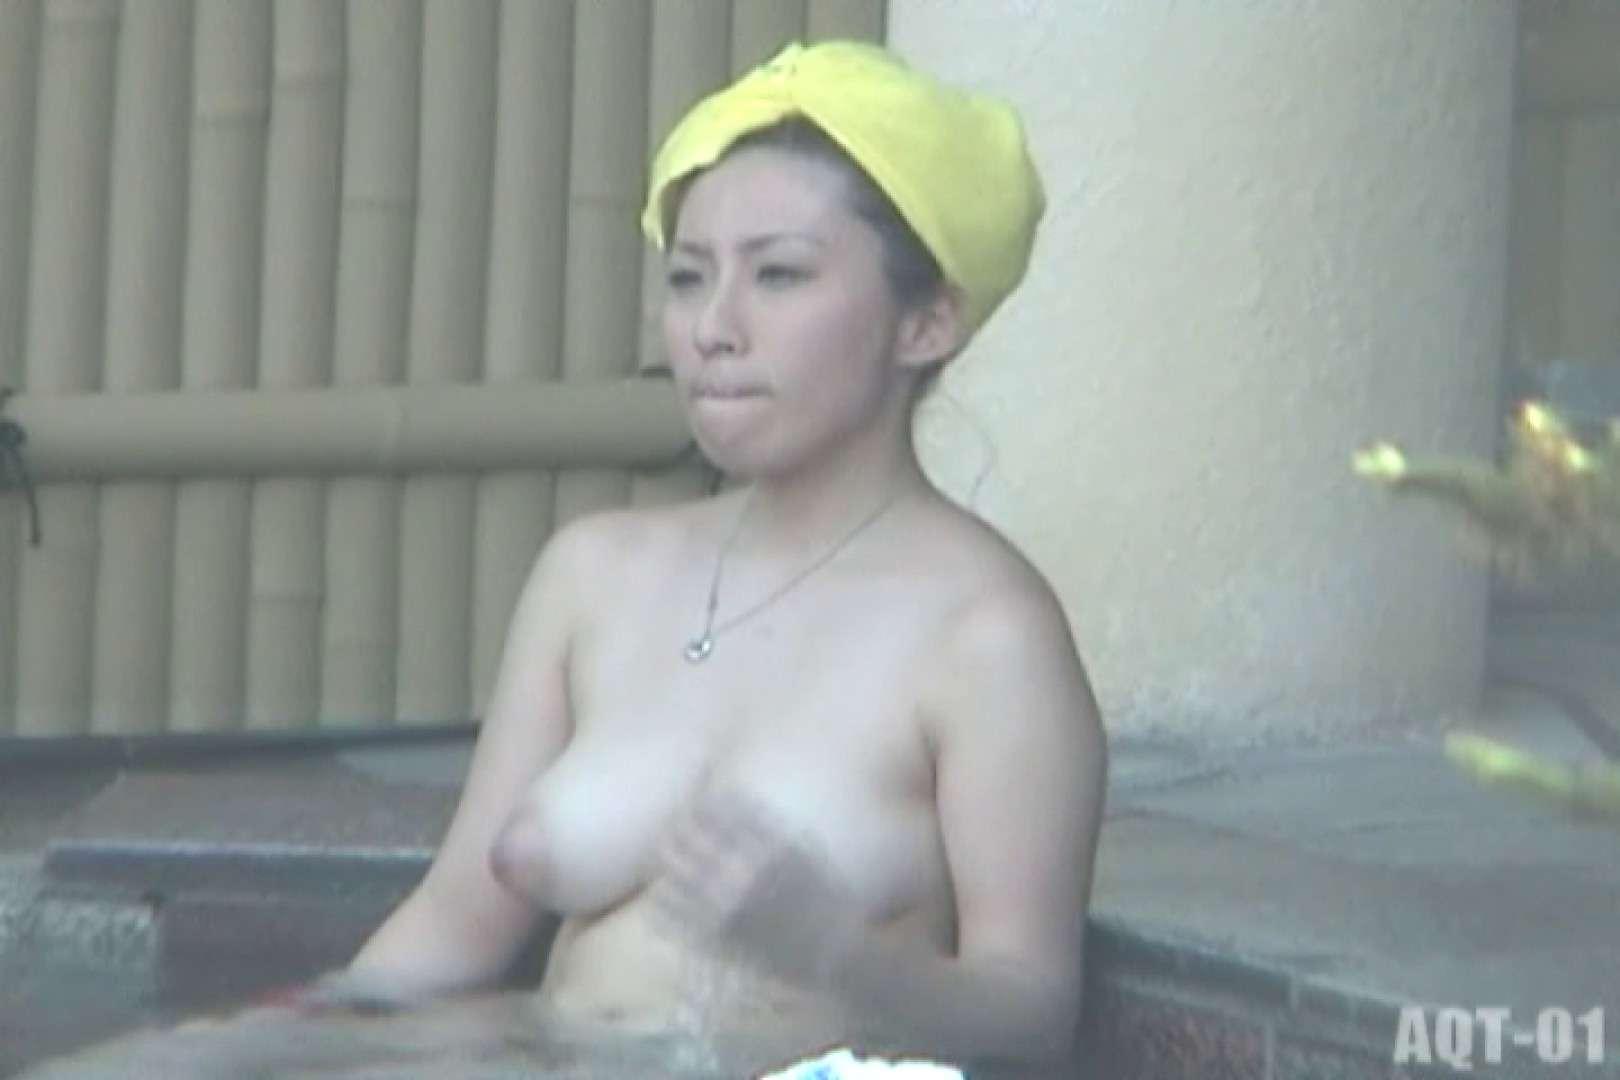 Aquaな露天風呂Vol.713 HなOL | 露天  52pic 44